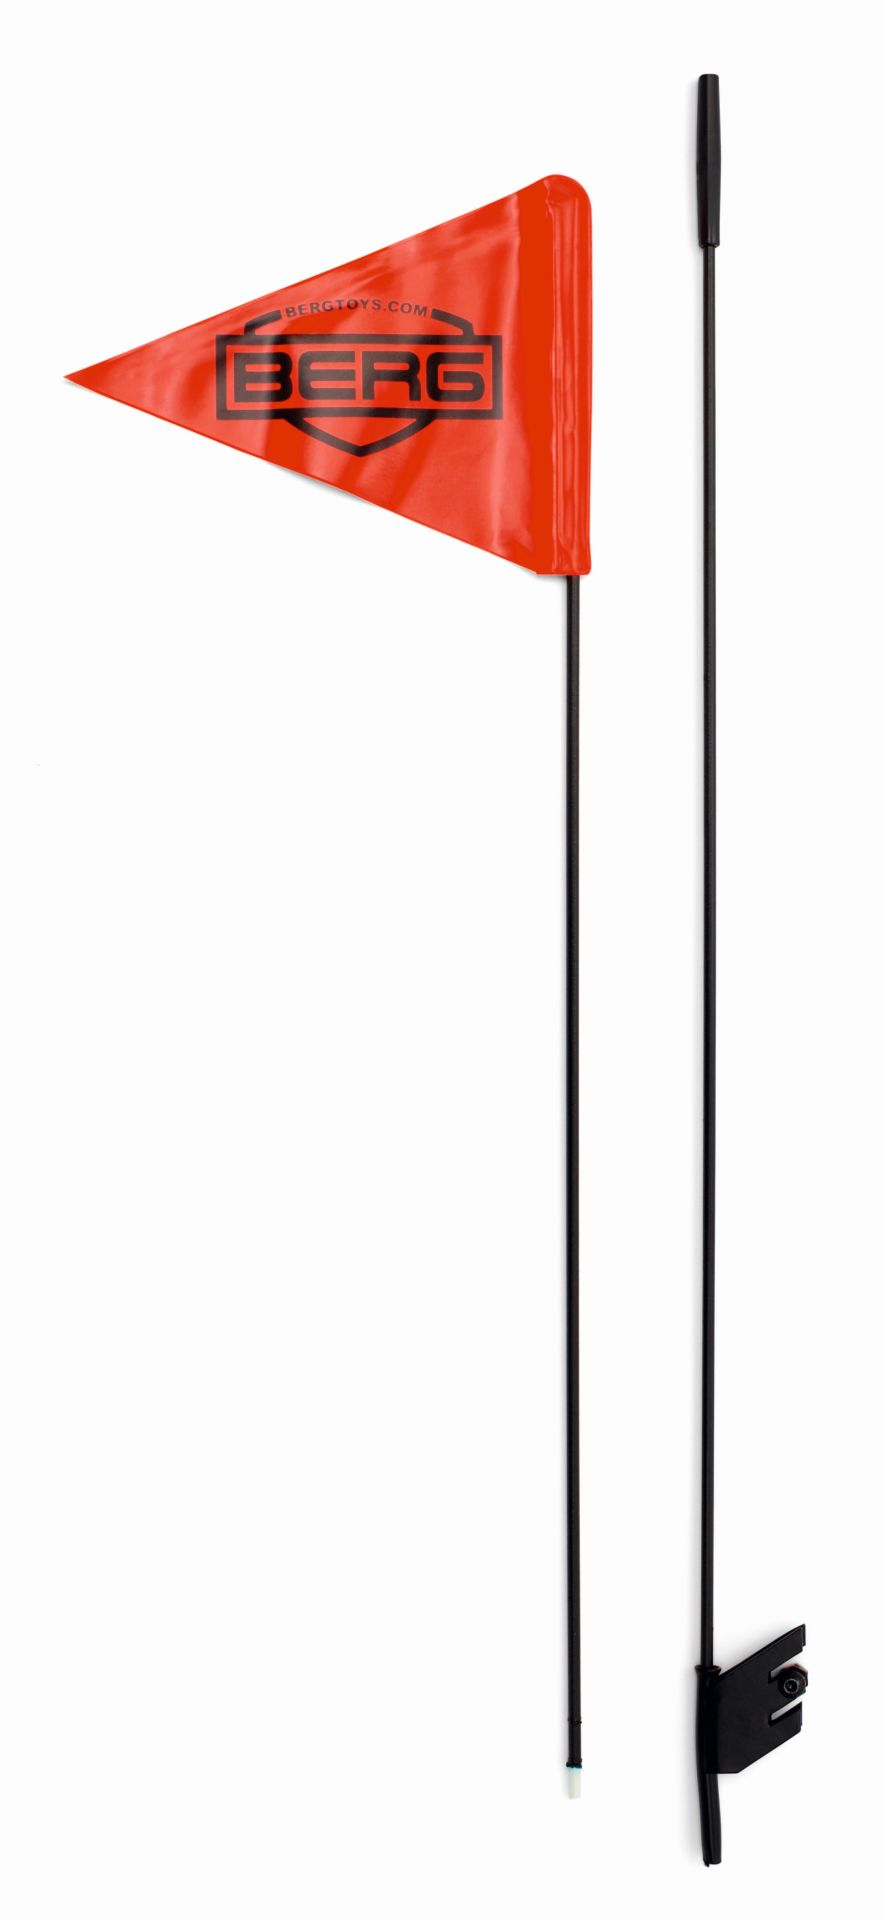 BERG Buddy Flag